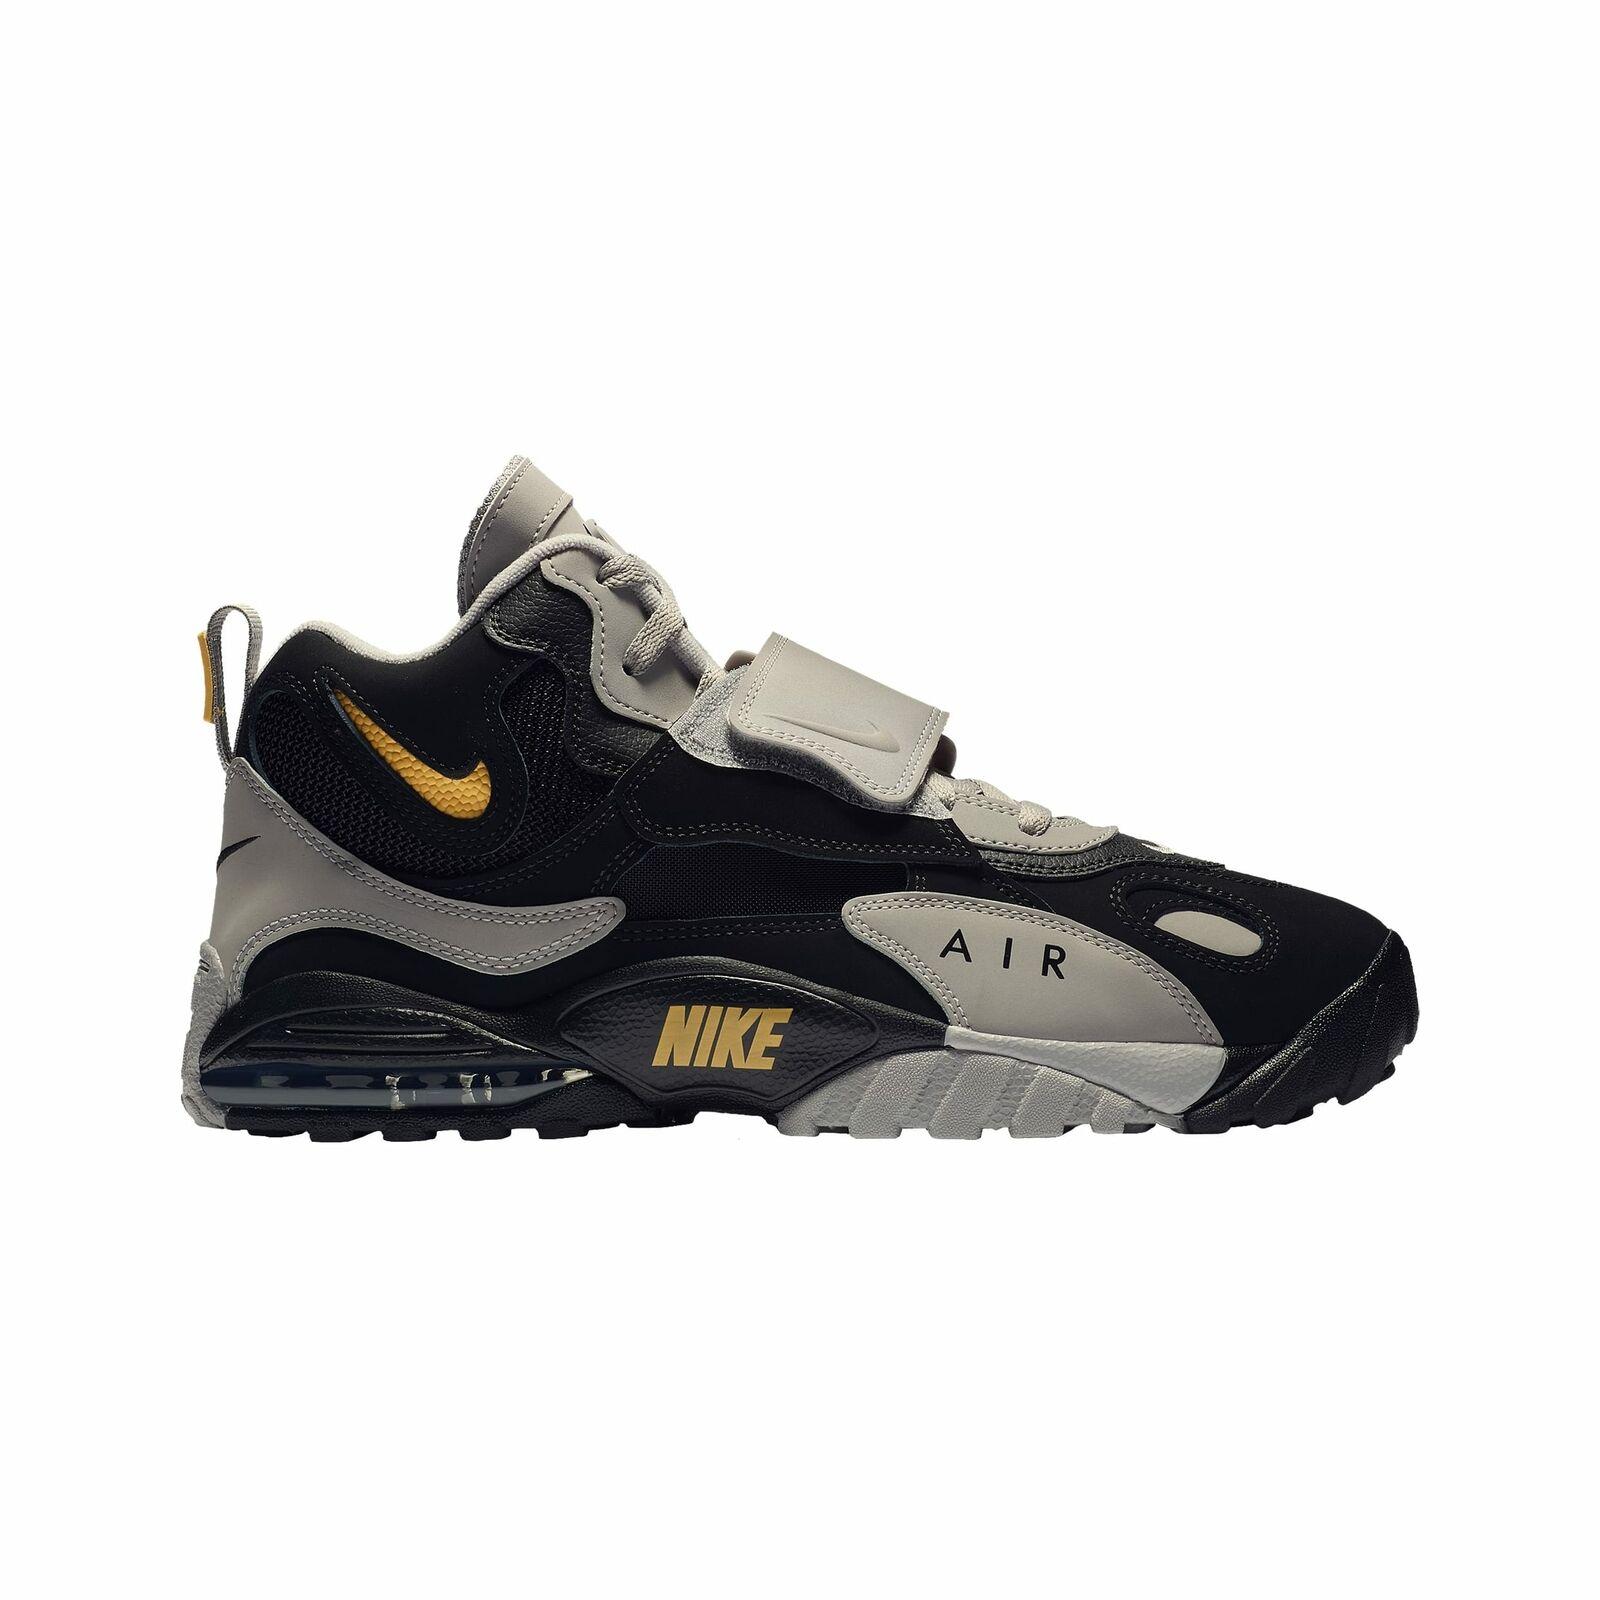 Nike Air Max Speed Turf - Men's Black Grey Yellow V7895001